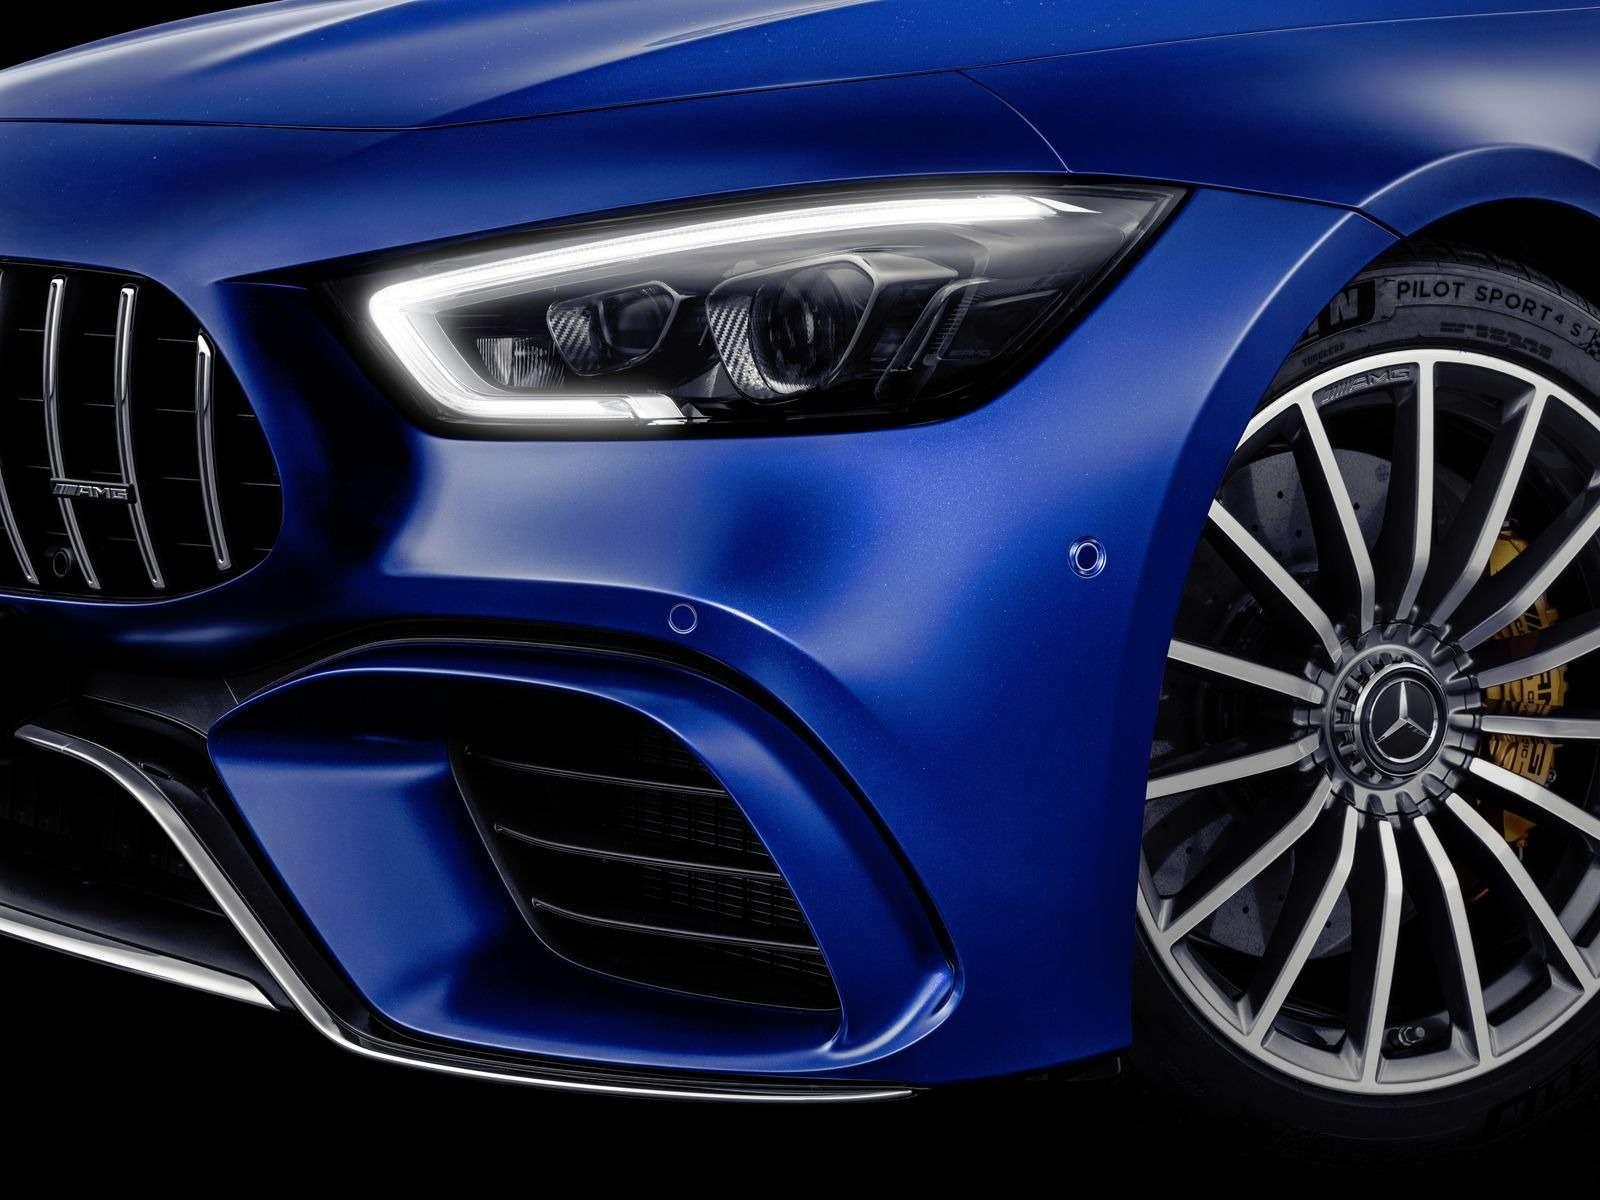 Подмена! Пятидверный Mercedes-AMG GTполучил «тележку» Е-класса— фото 851520